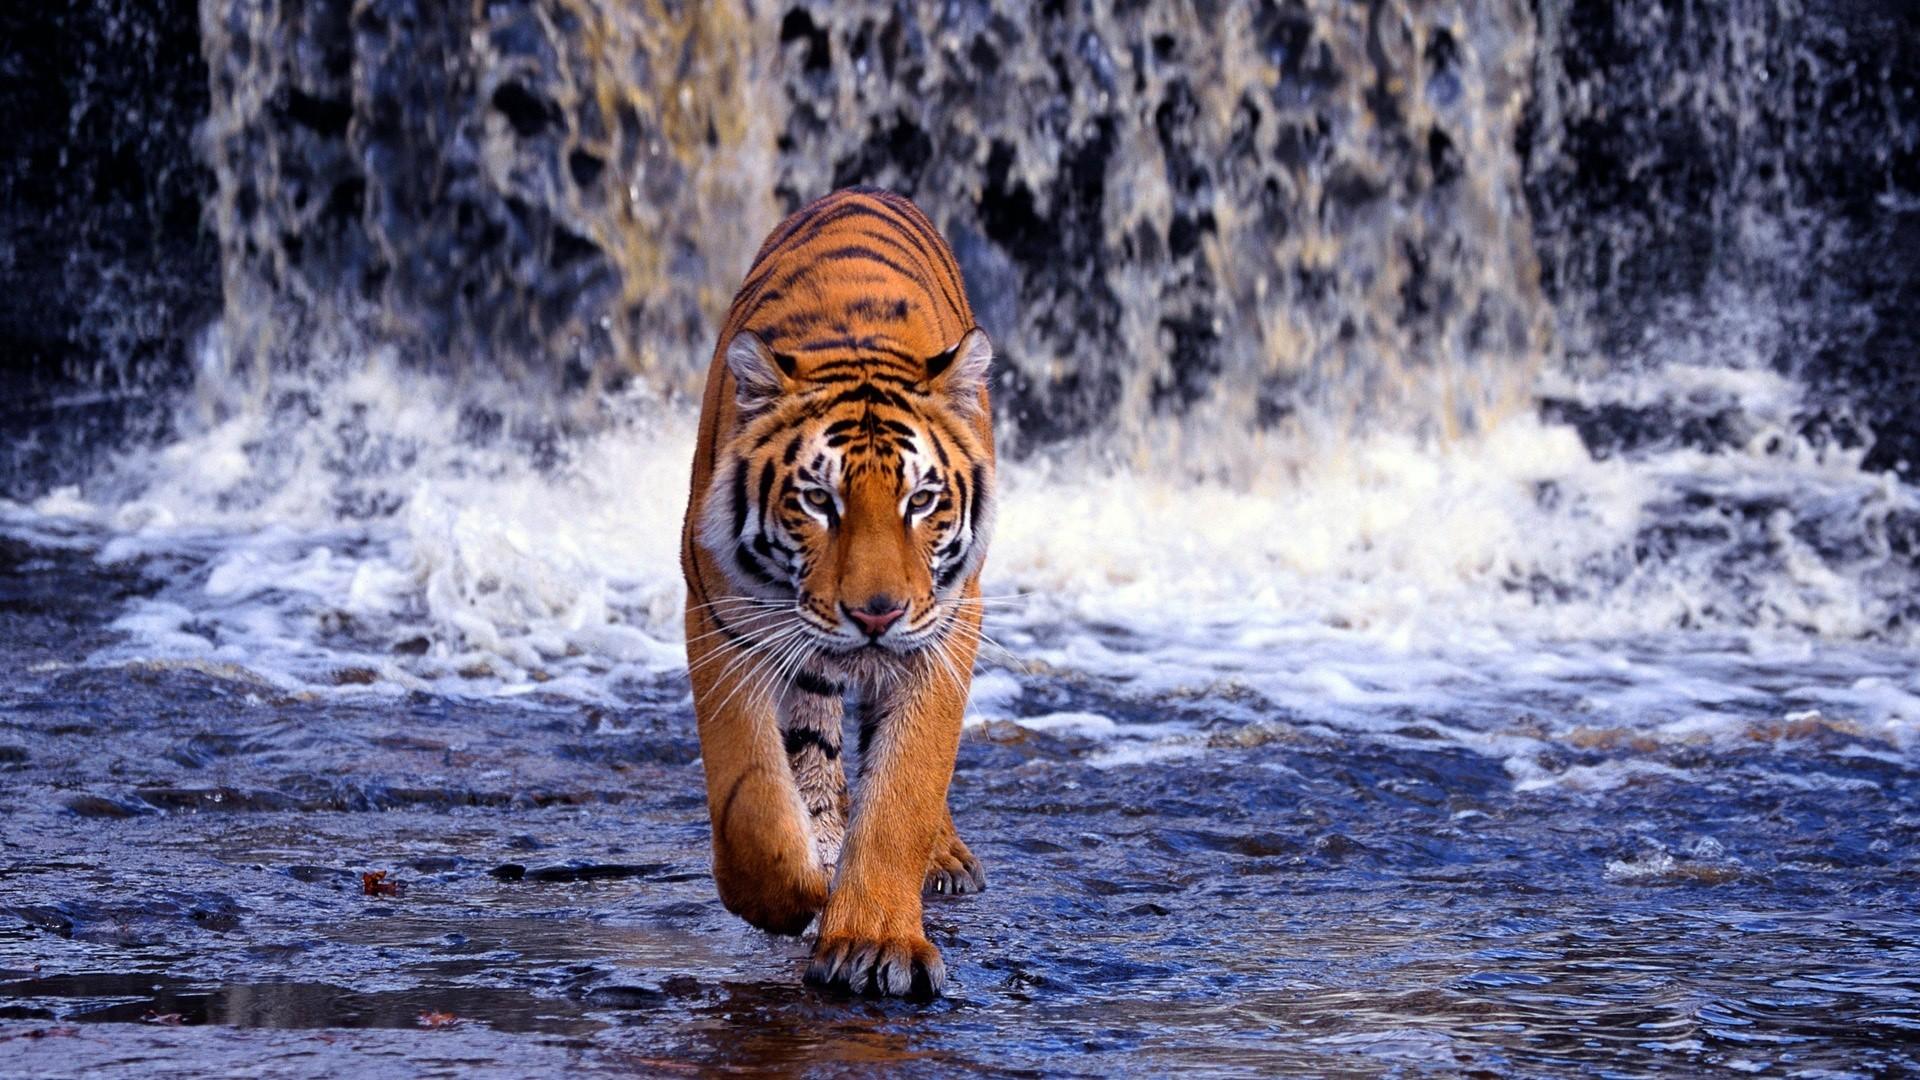 Res: 1920x1080, tiger running waterfall wallpaper animals animal fall animal wallpaper free  hd for android iphone ipad pictures desktop